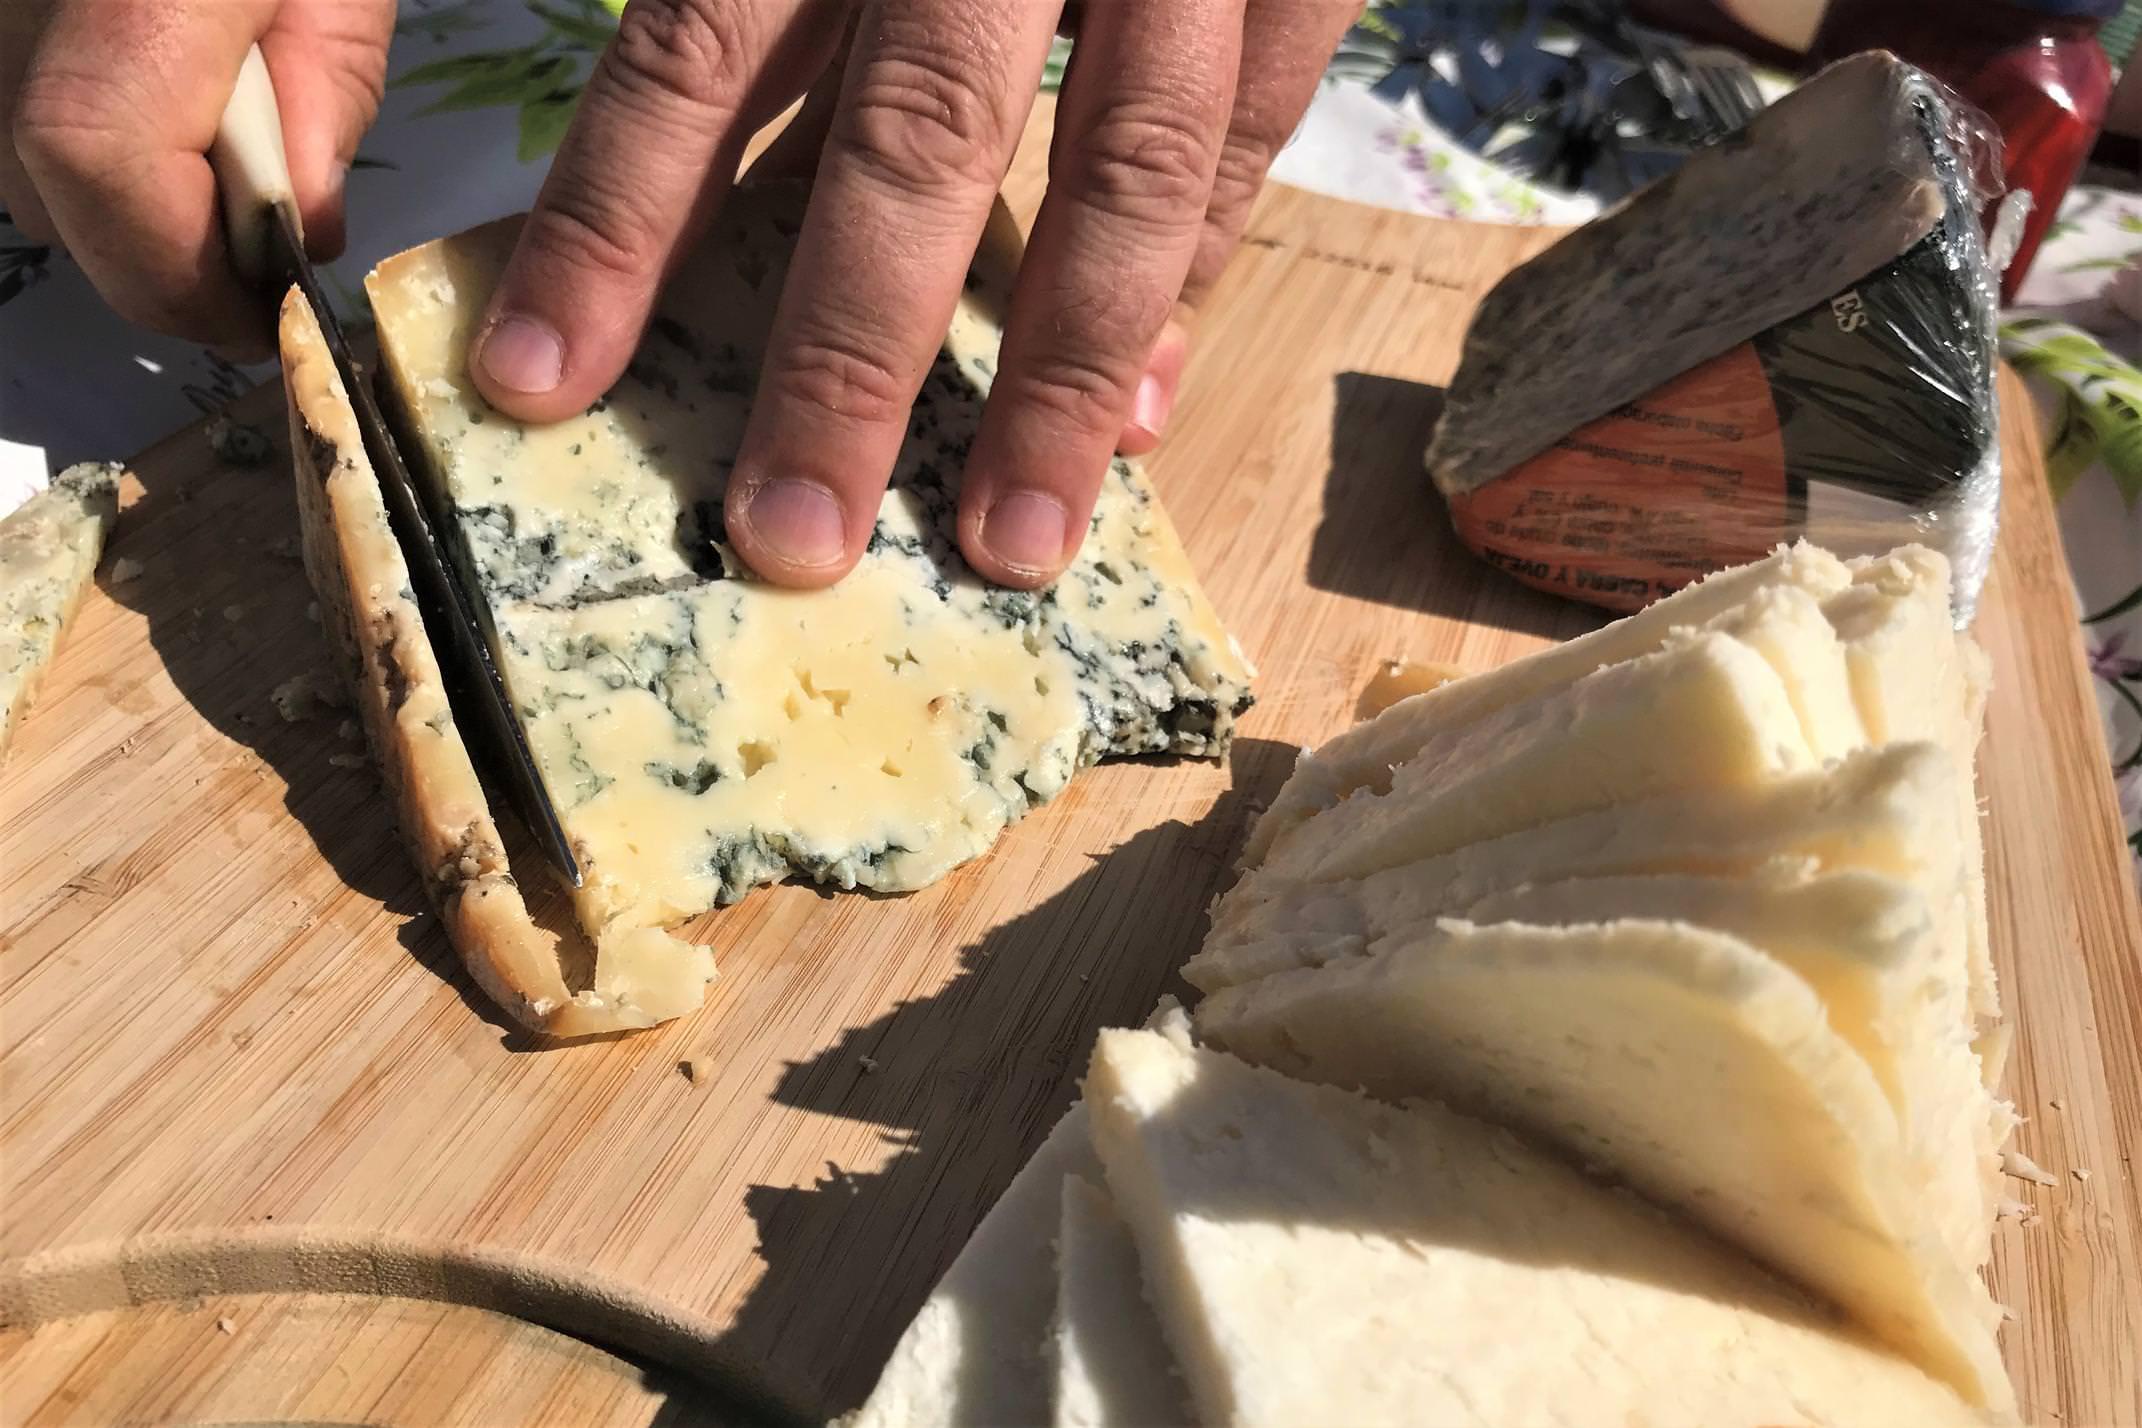 Spain picos de europa cheese cutting various cheeses close up